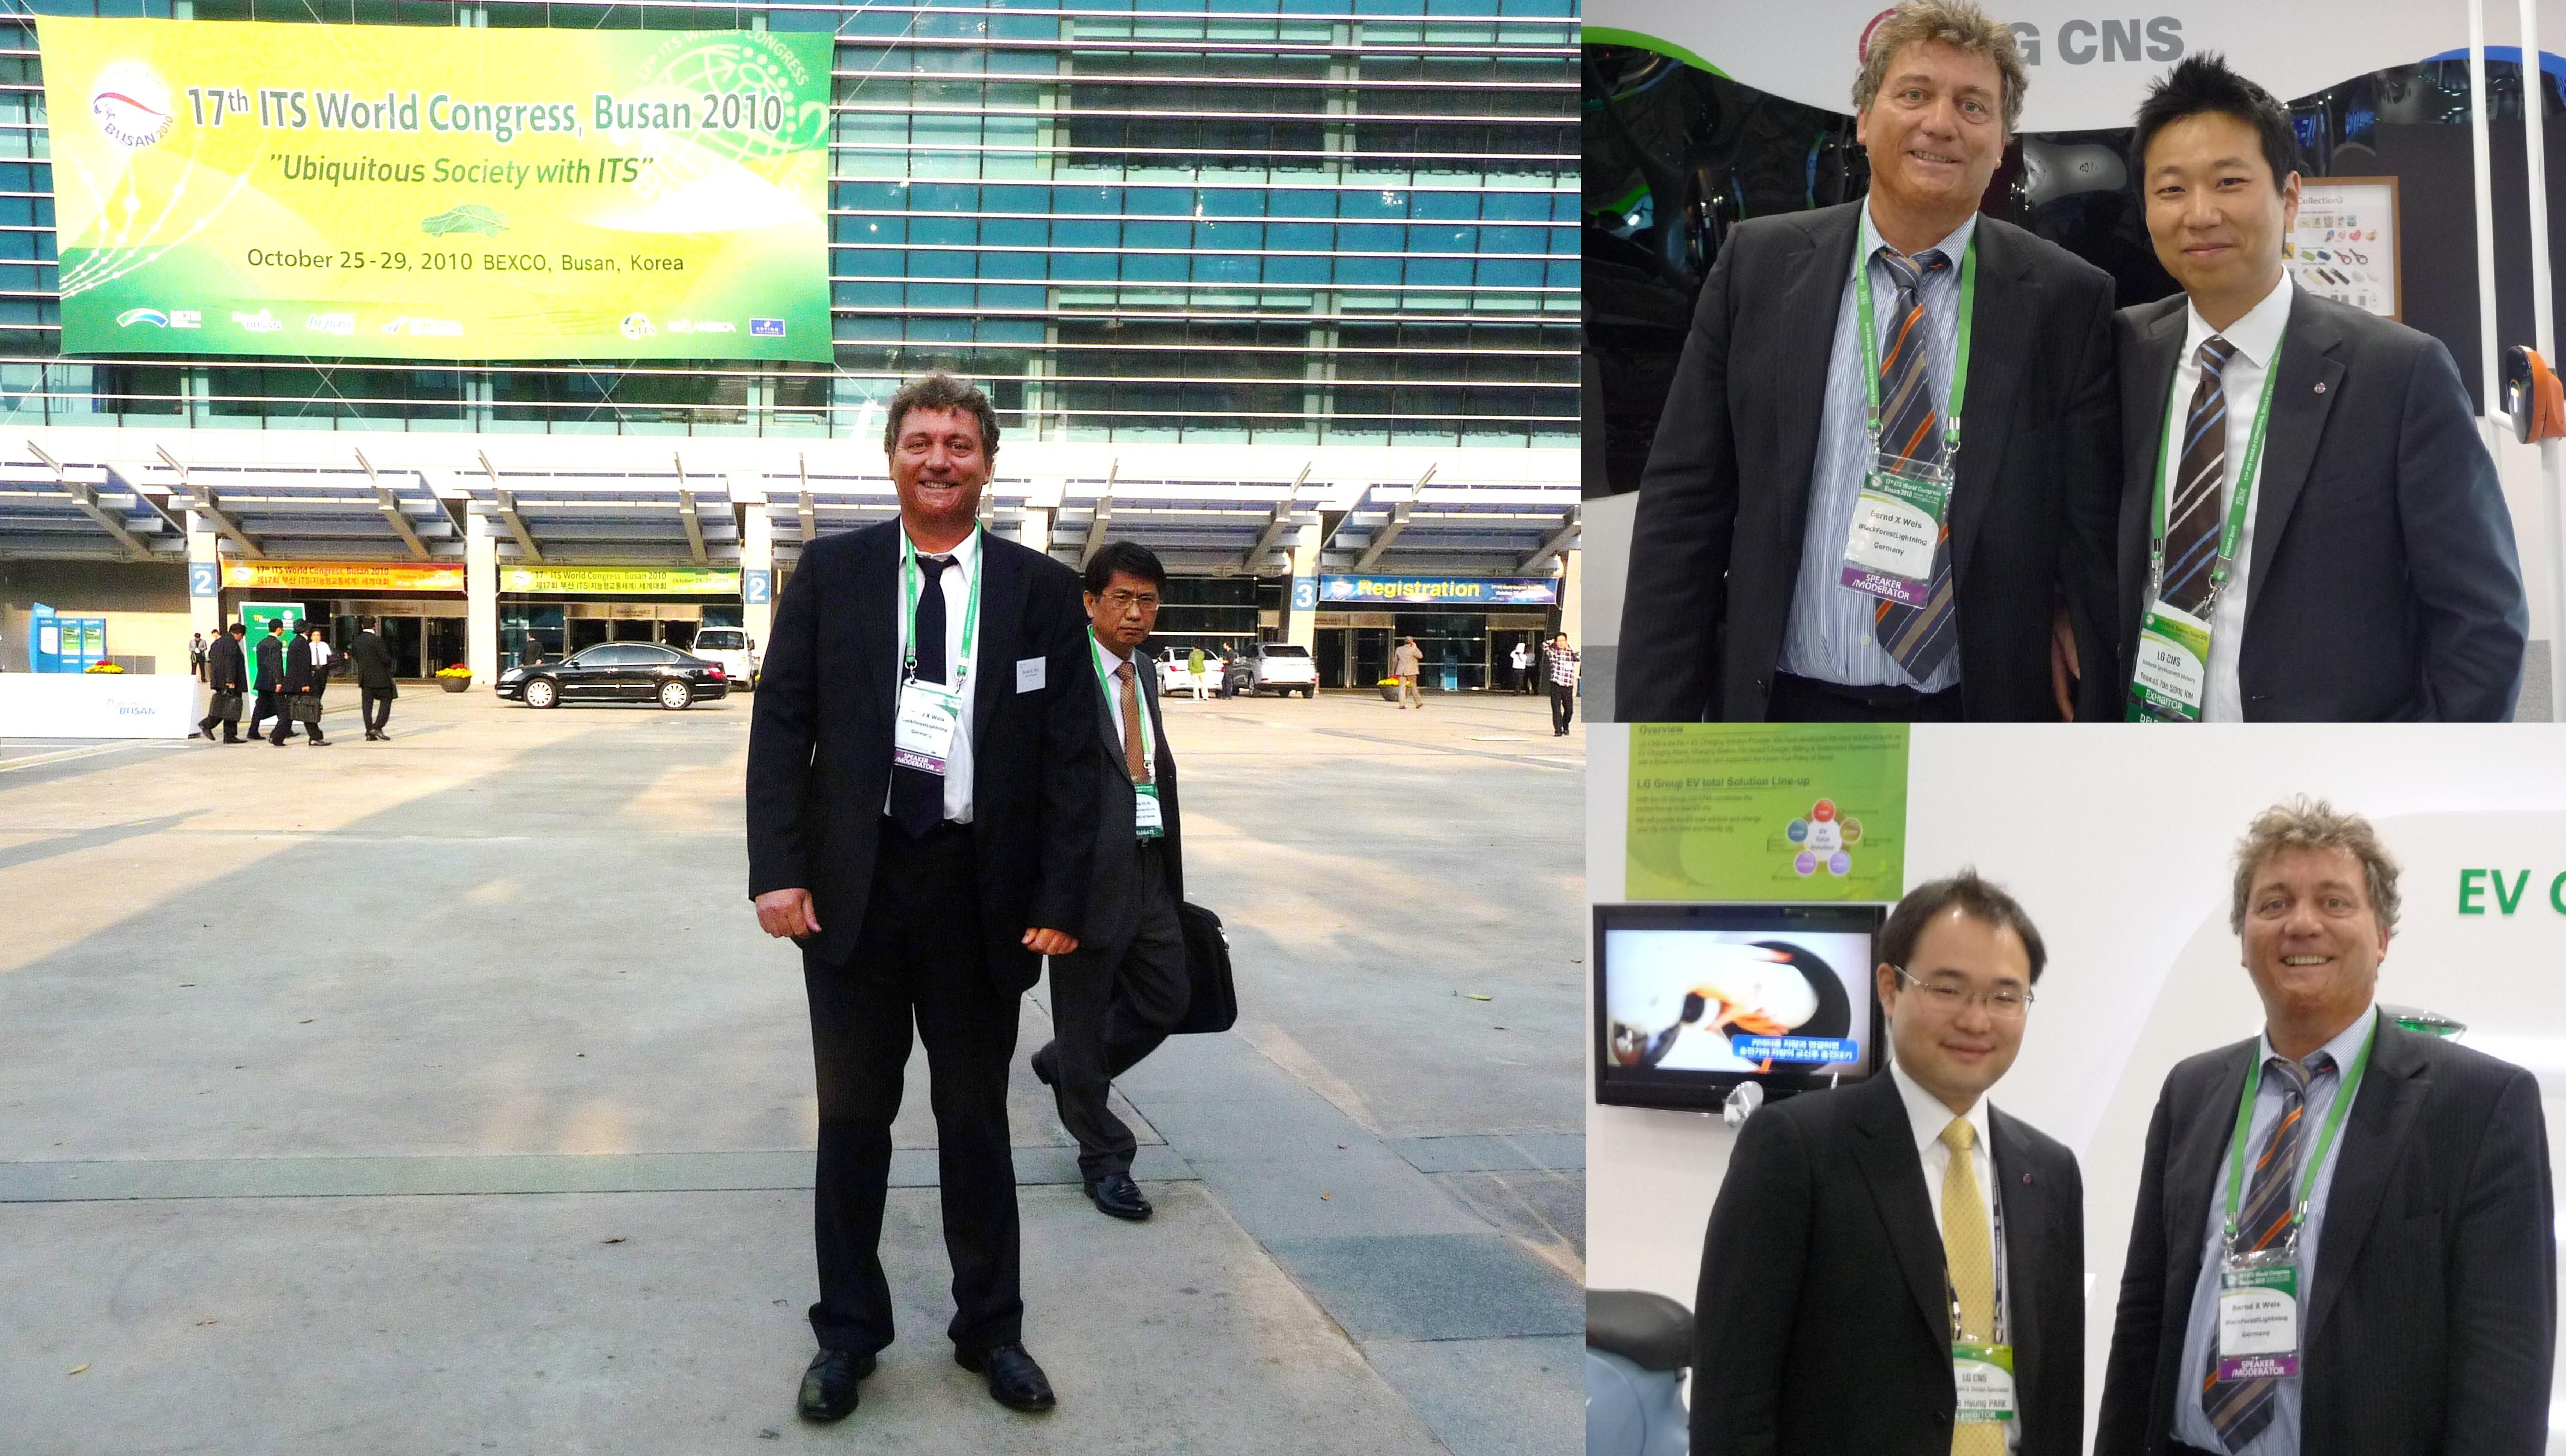 At ITS World Congress 2010 in Busan, Korea